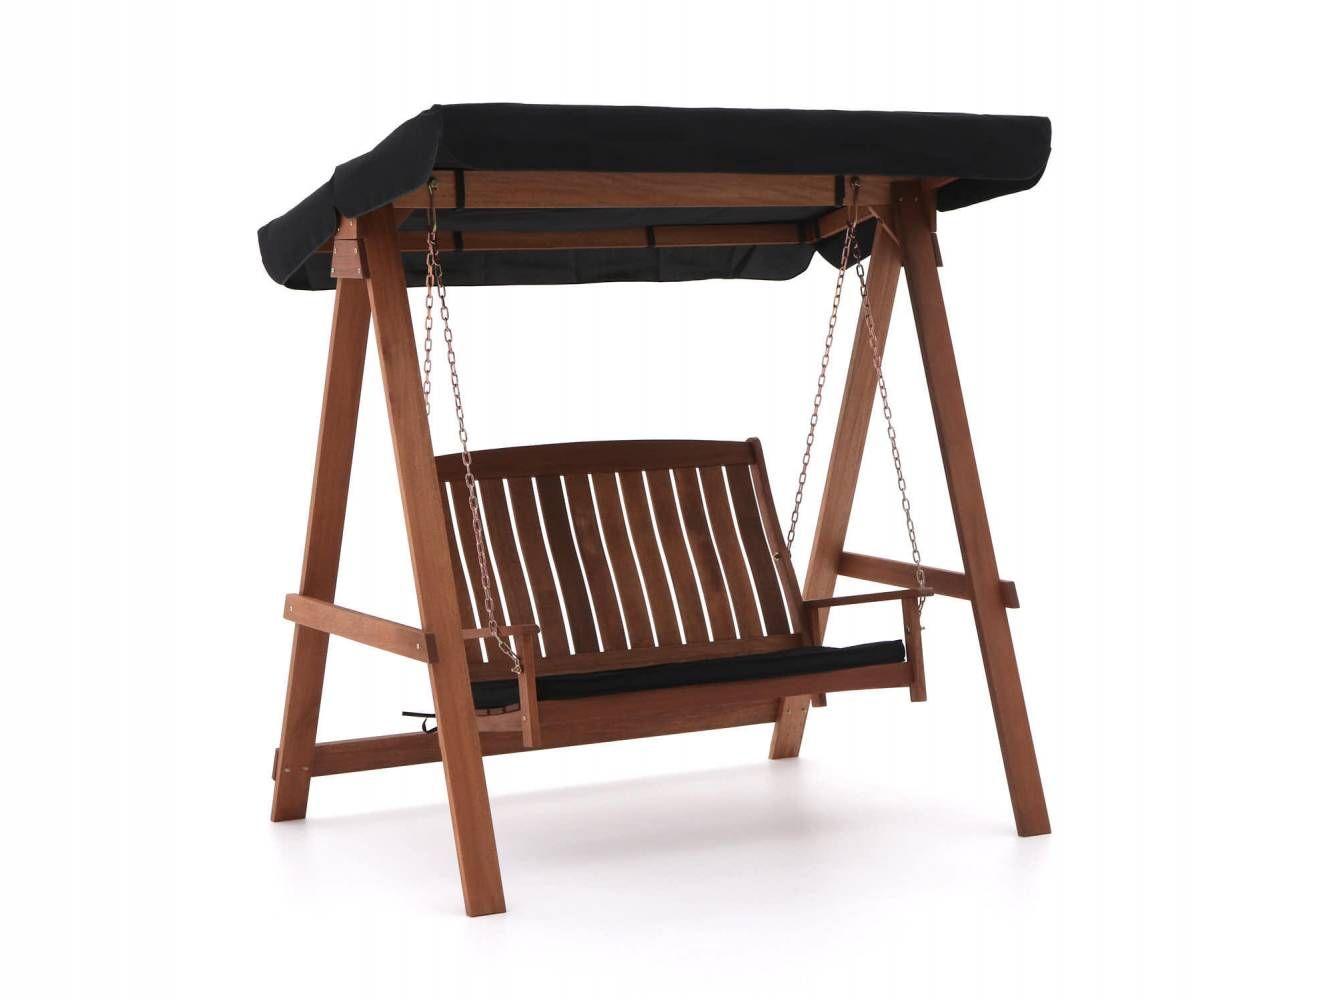 Schommelbank Royal Swing.R S Design Sintra Schommelbank 166x118cm Tuin Ideeen Porch Swing